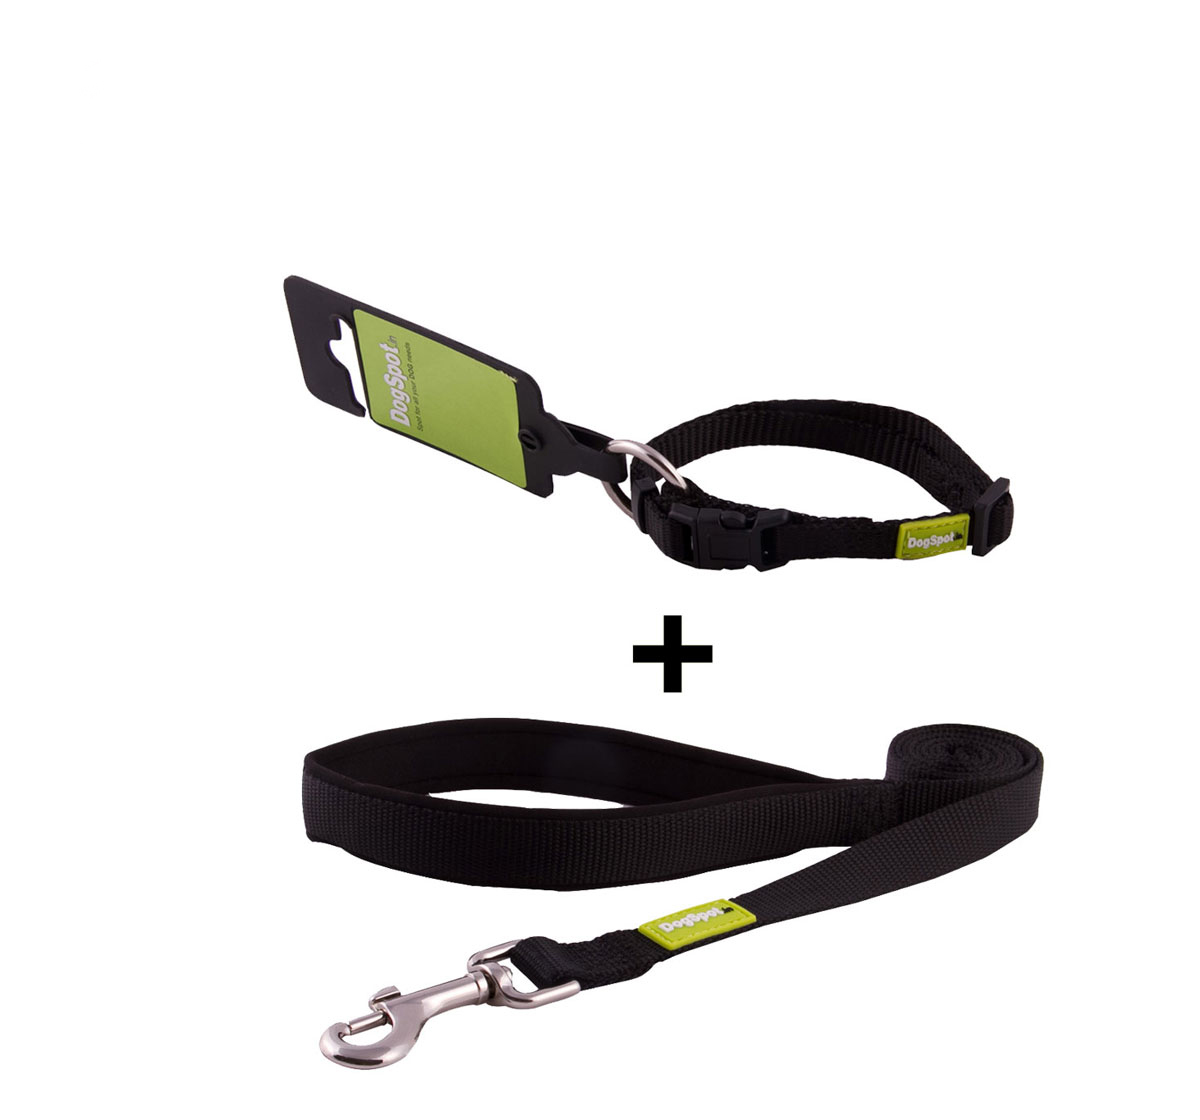 DogSpot Premium Leash and Collar Set Black 10 mm - Small